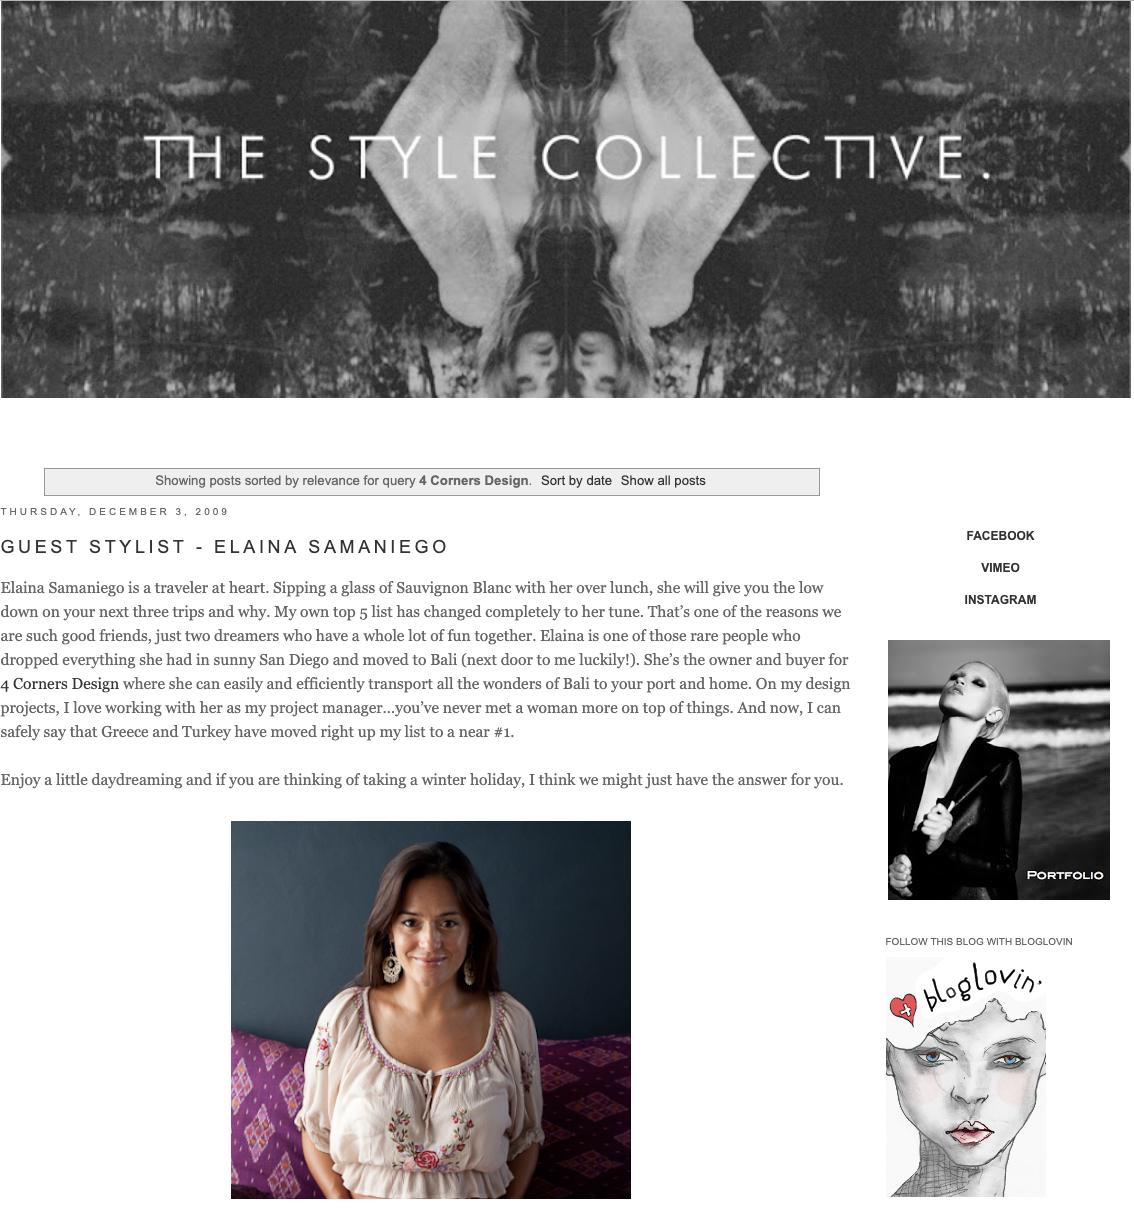 GUEST STYLIST: ELAINA SAMANIEGO - THE STYLE COLLECTIVE